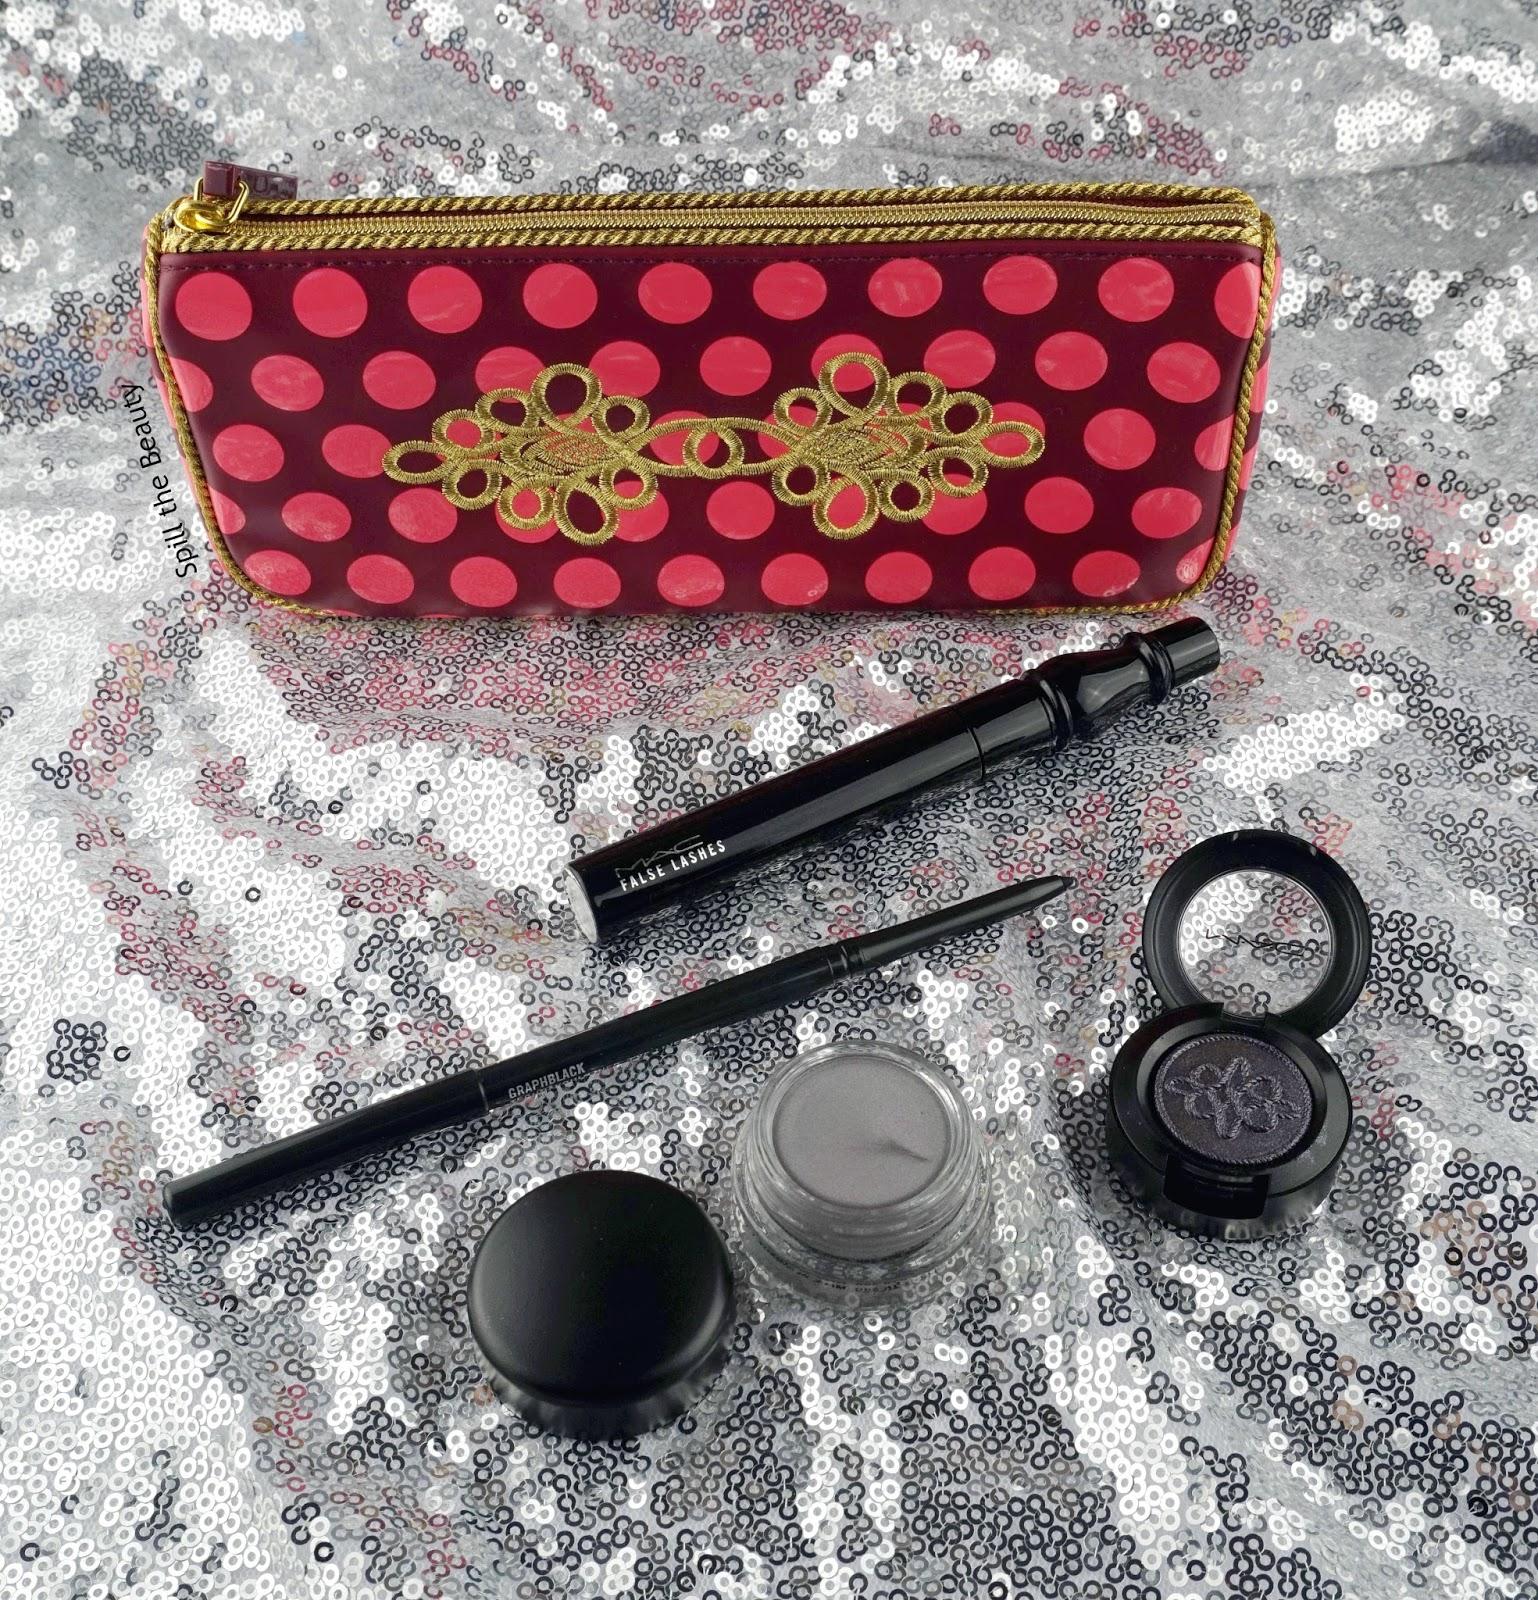 mac nutcracker sweet smoky eye bag review